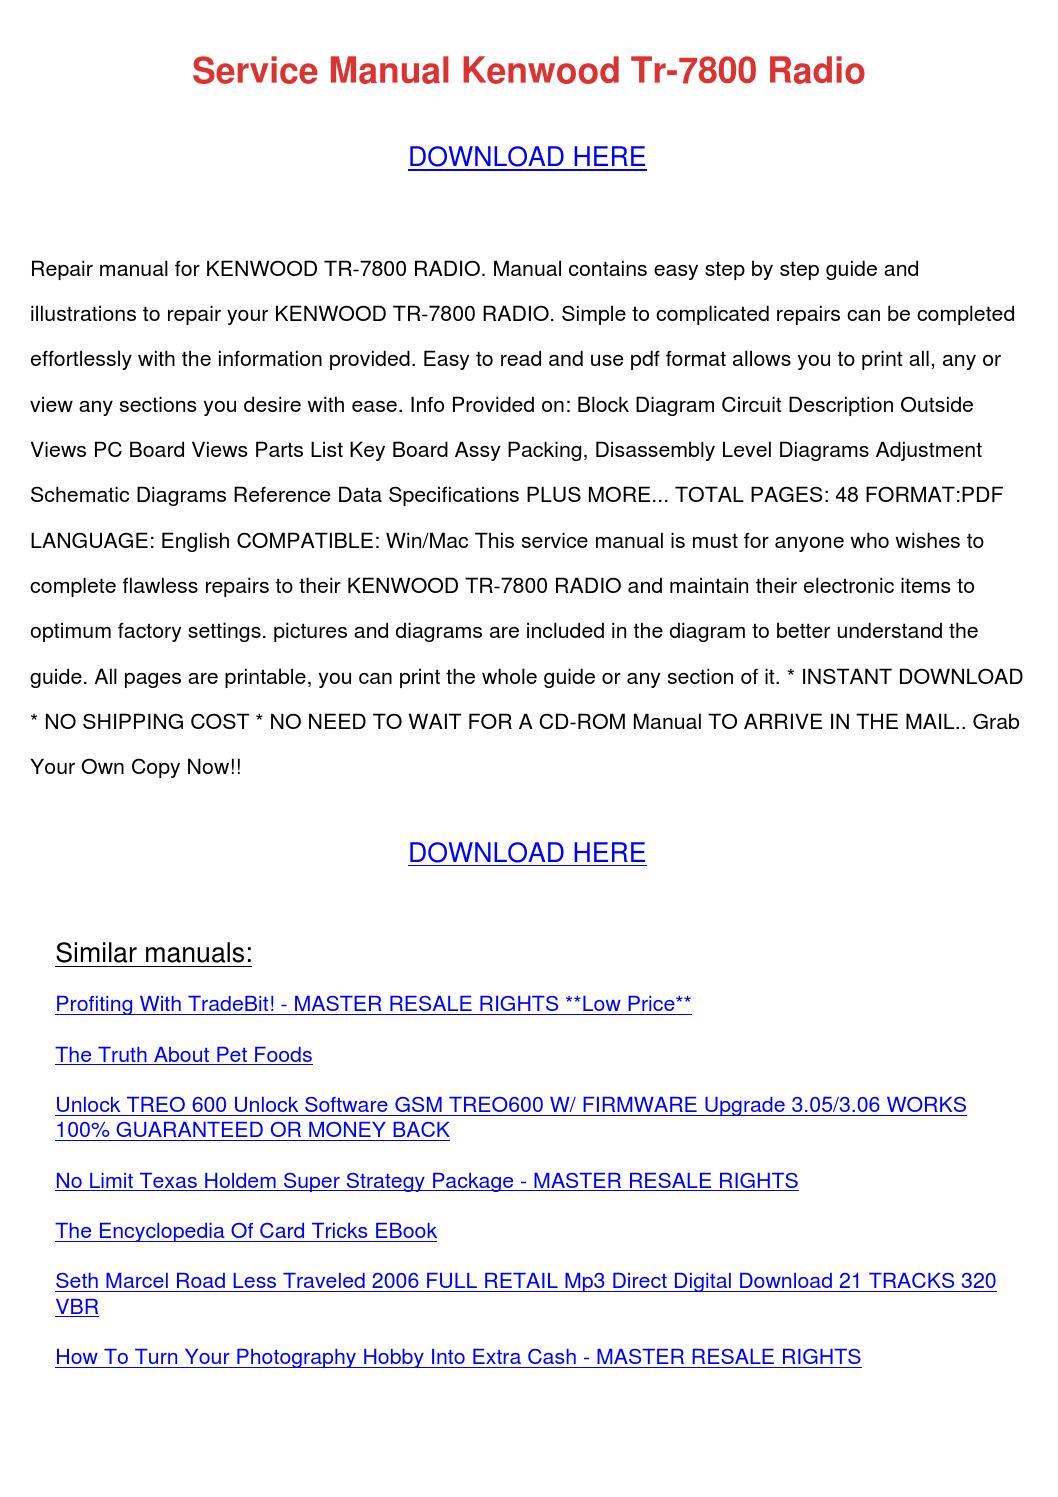 kenwood tr 7800 service manual